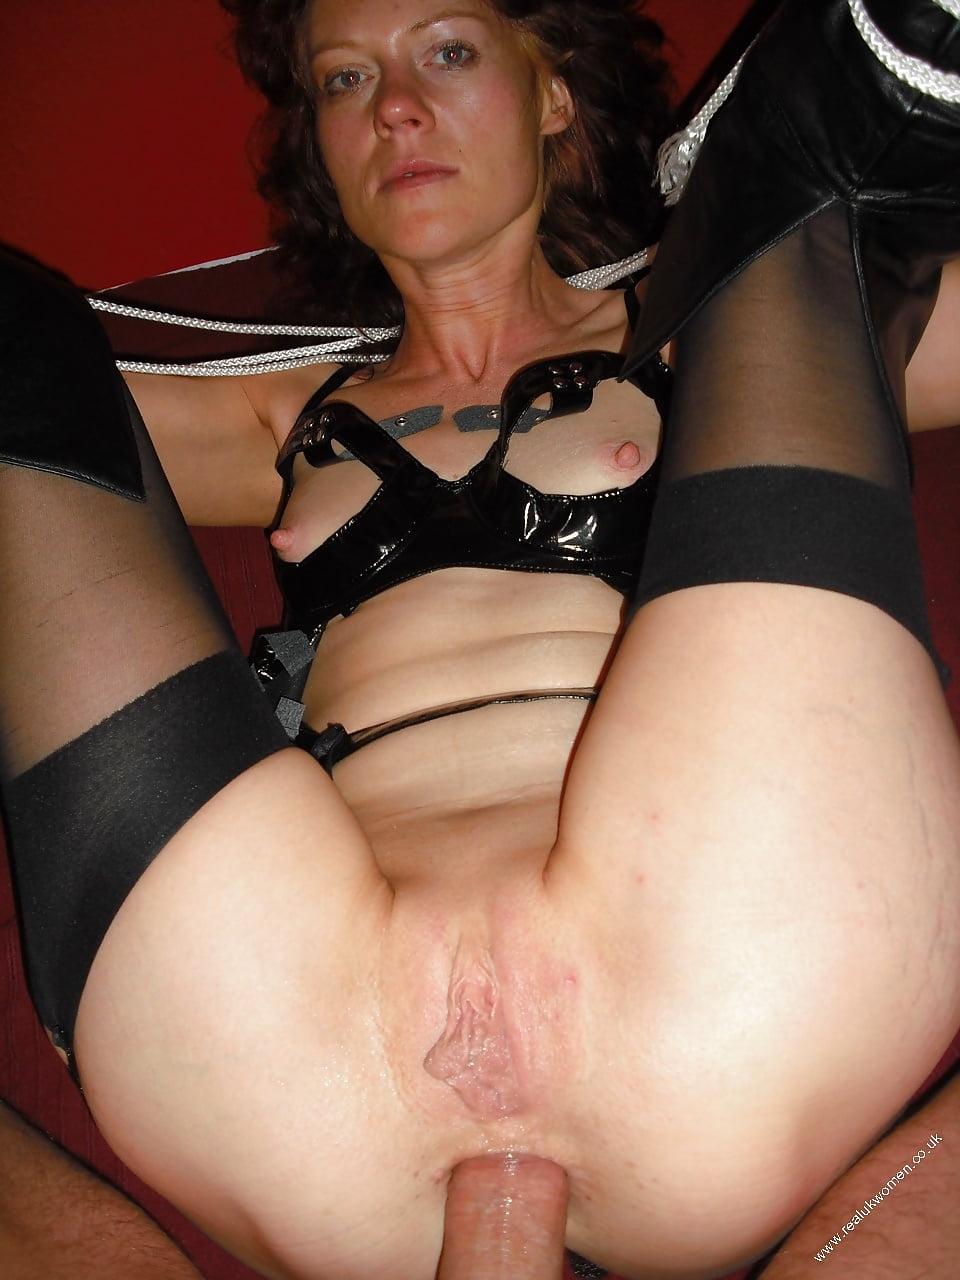 quality-kinky-amateur-wife-anal-sex-drive-pussy